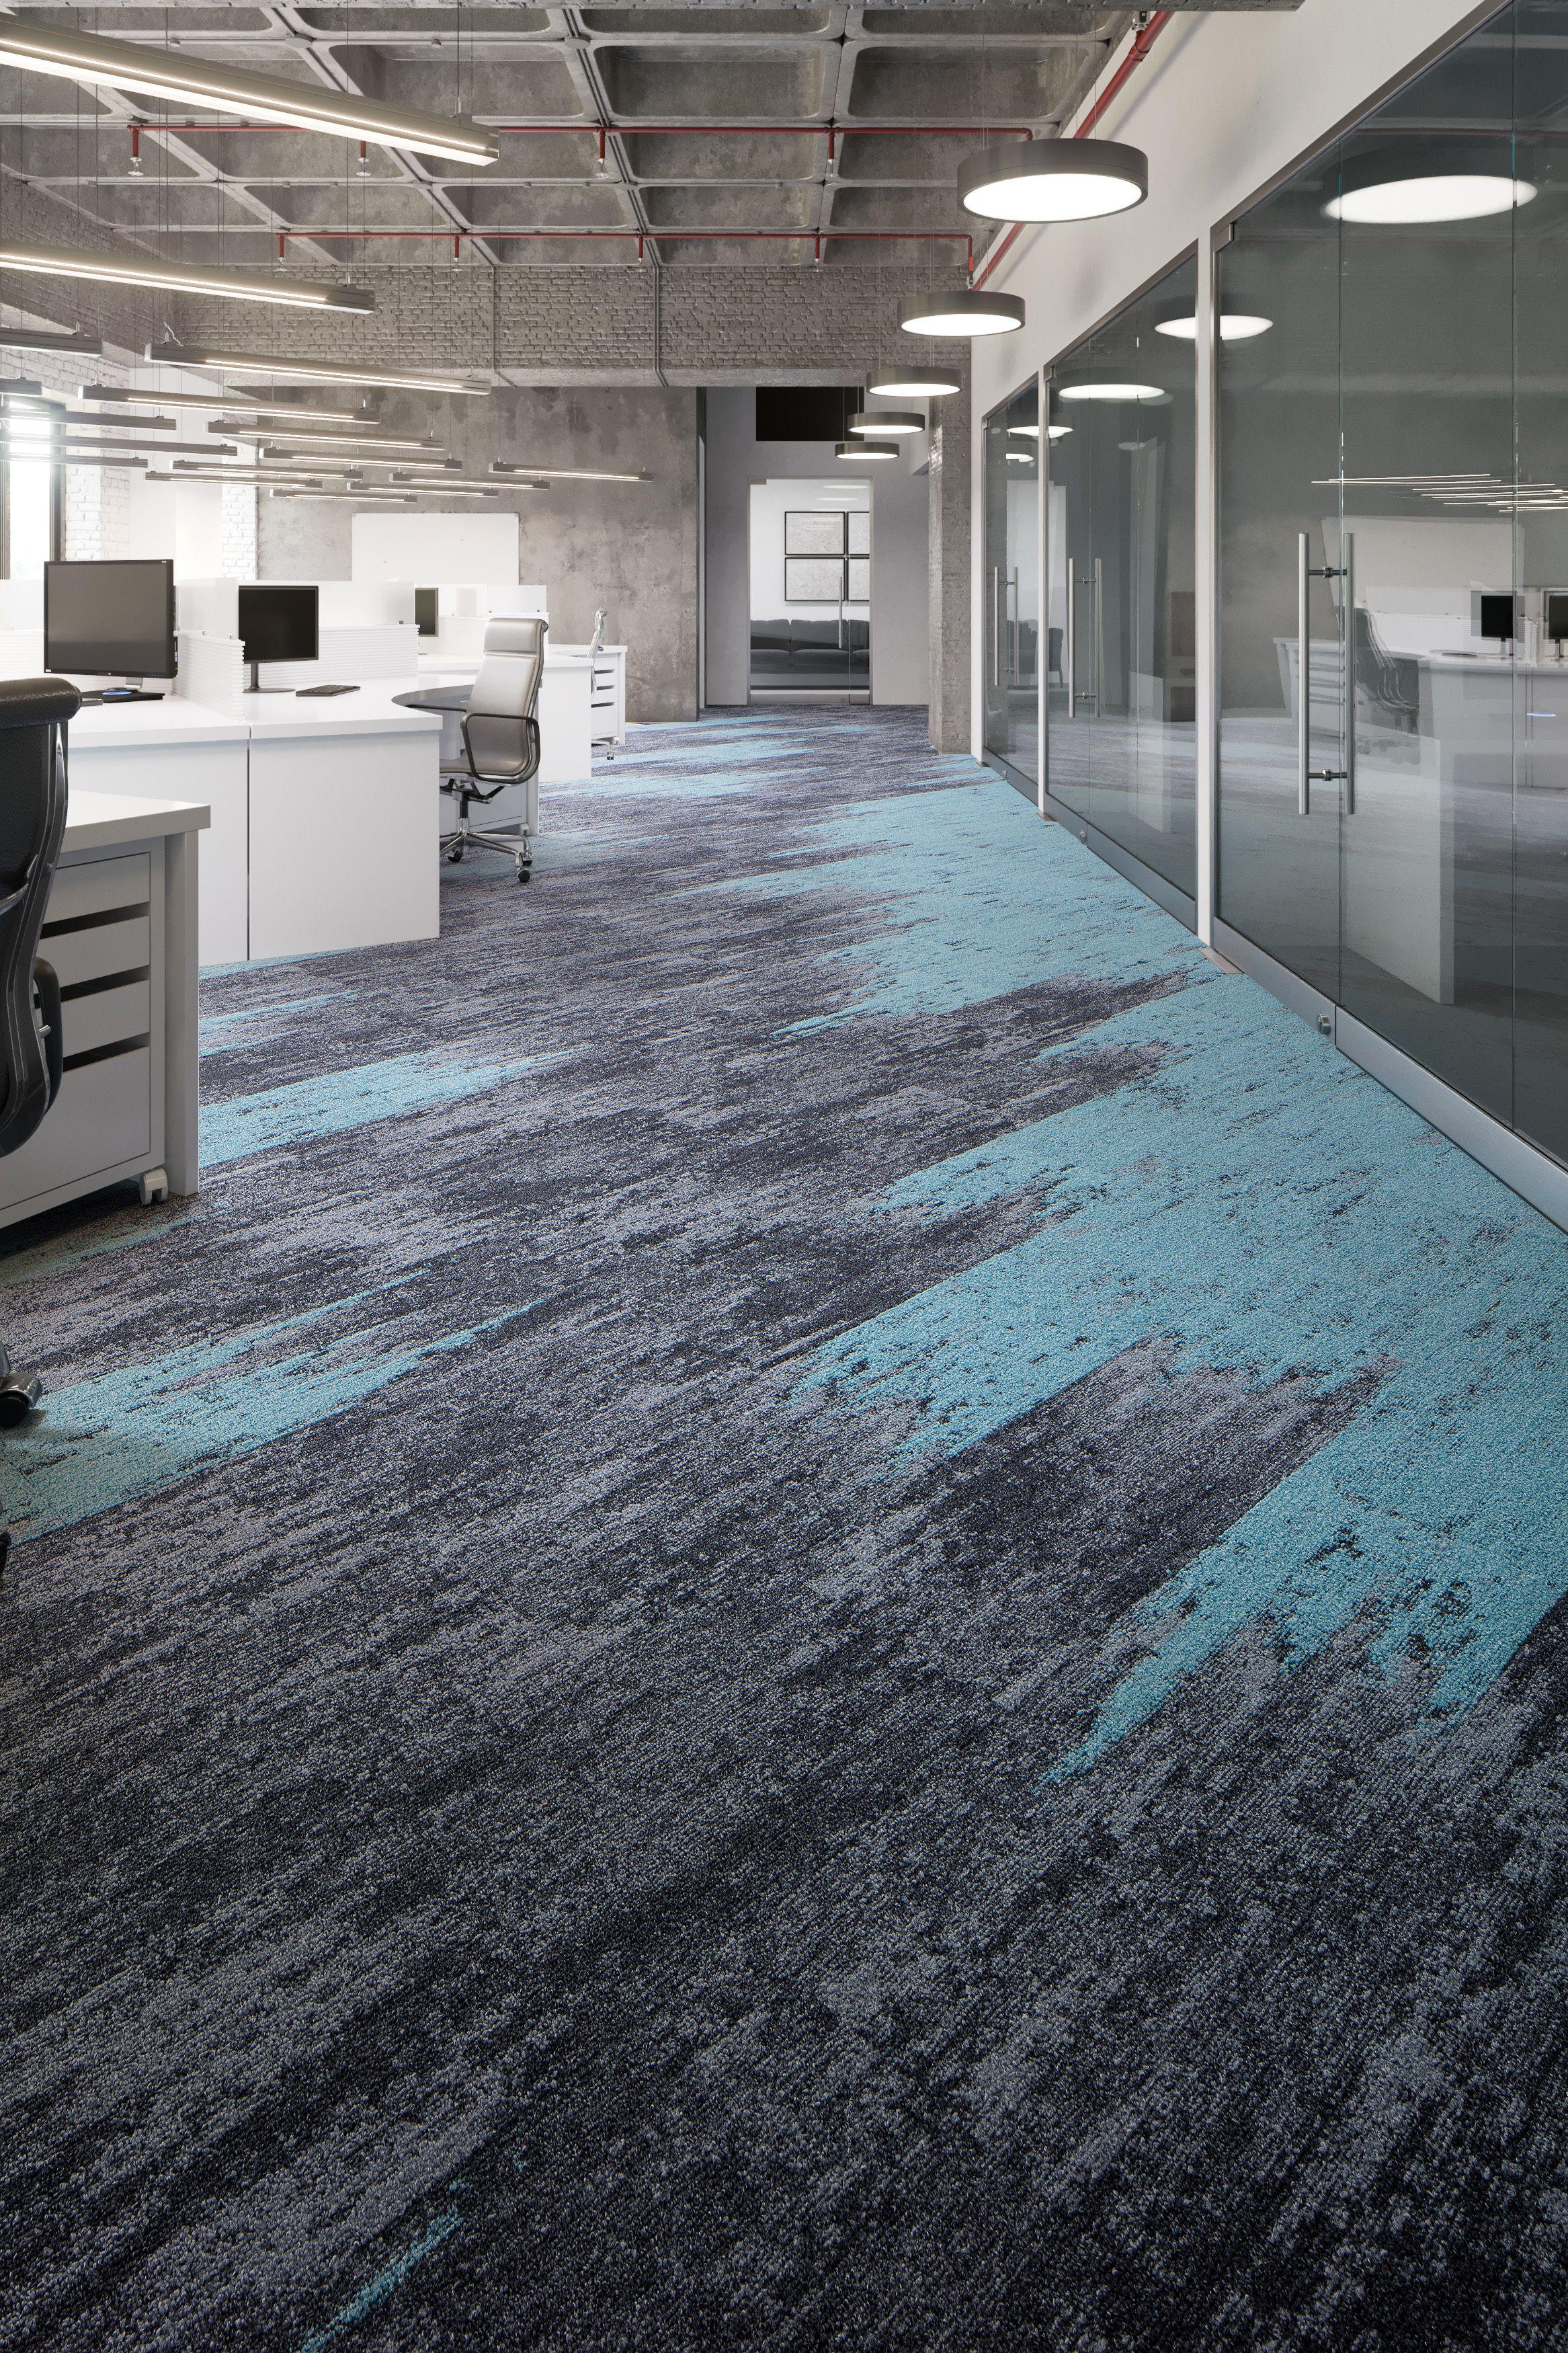 Mohawk Nutopia Carpet Carpet Tiles Office Textured Carpet Rugs